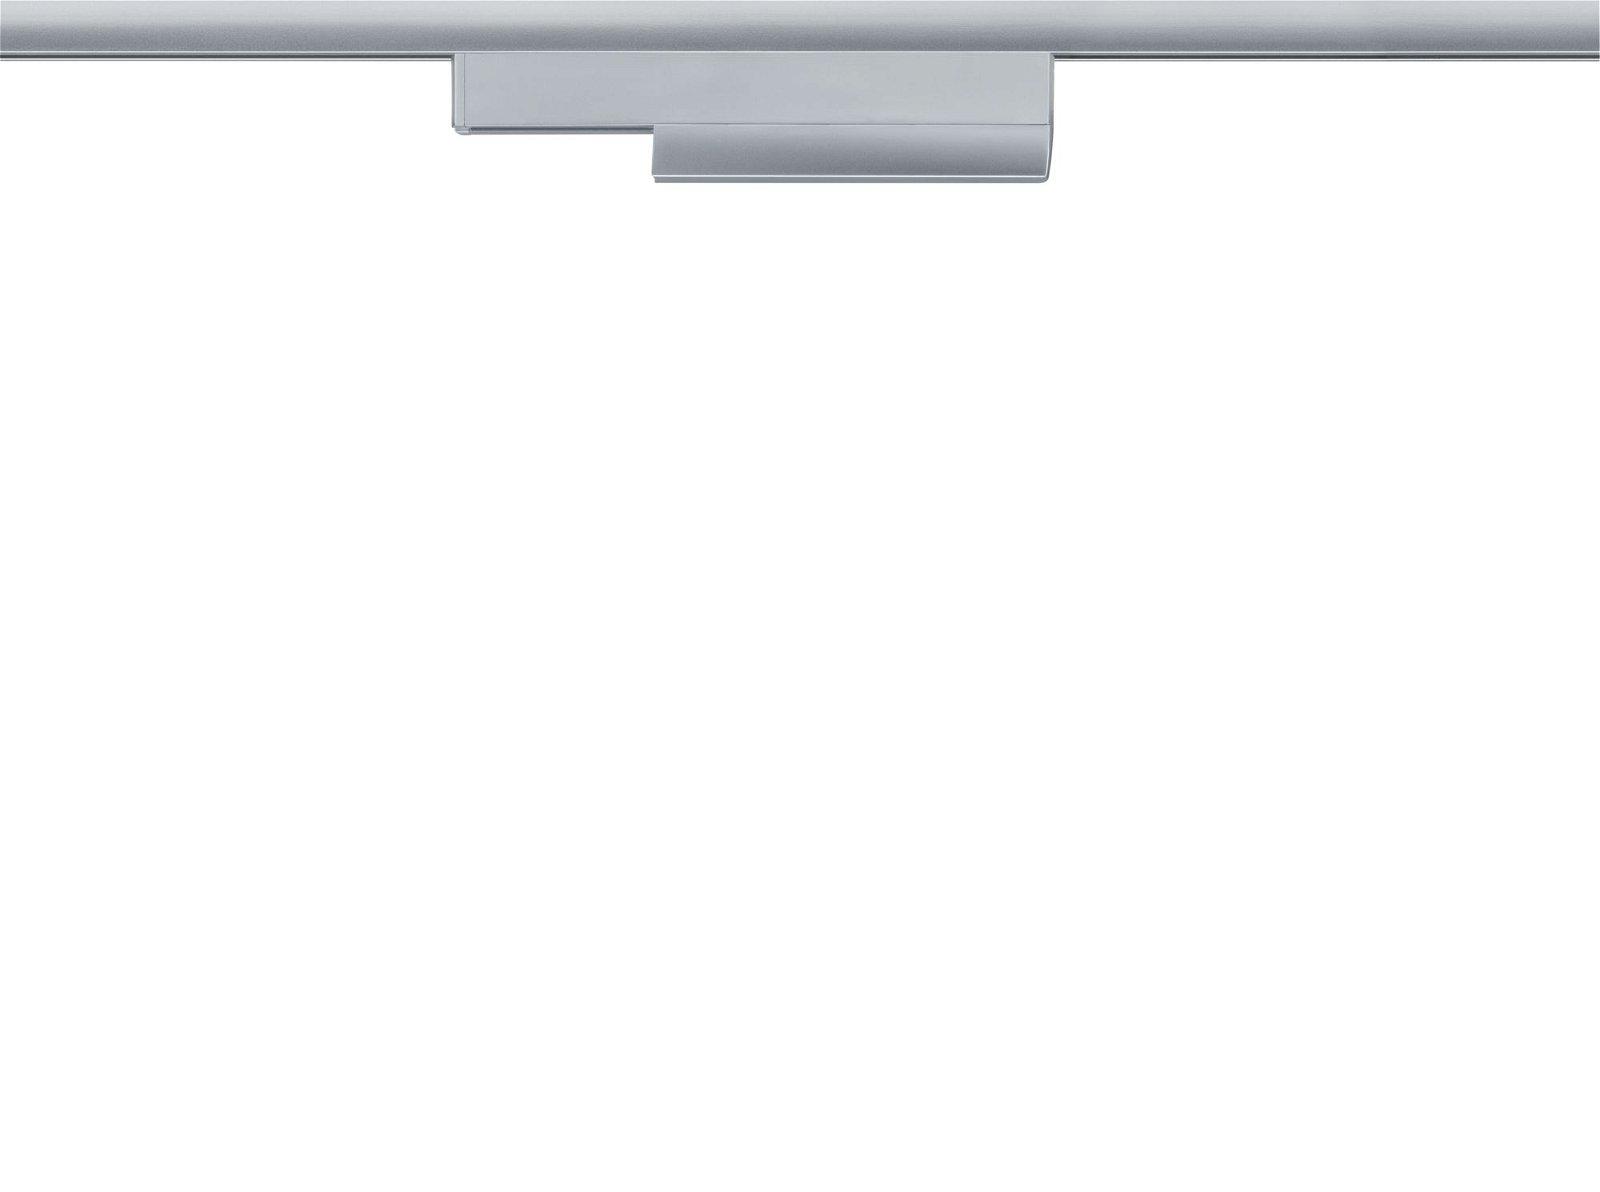 URail Railadapter On/Off/Dimm 166x20mm Chroom mat